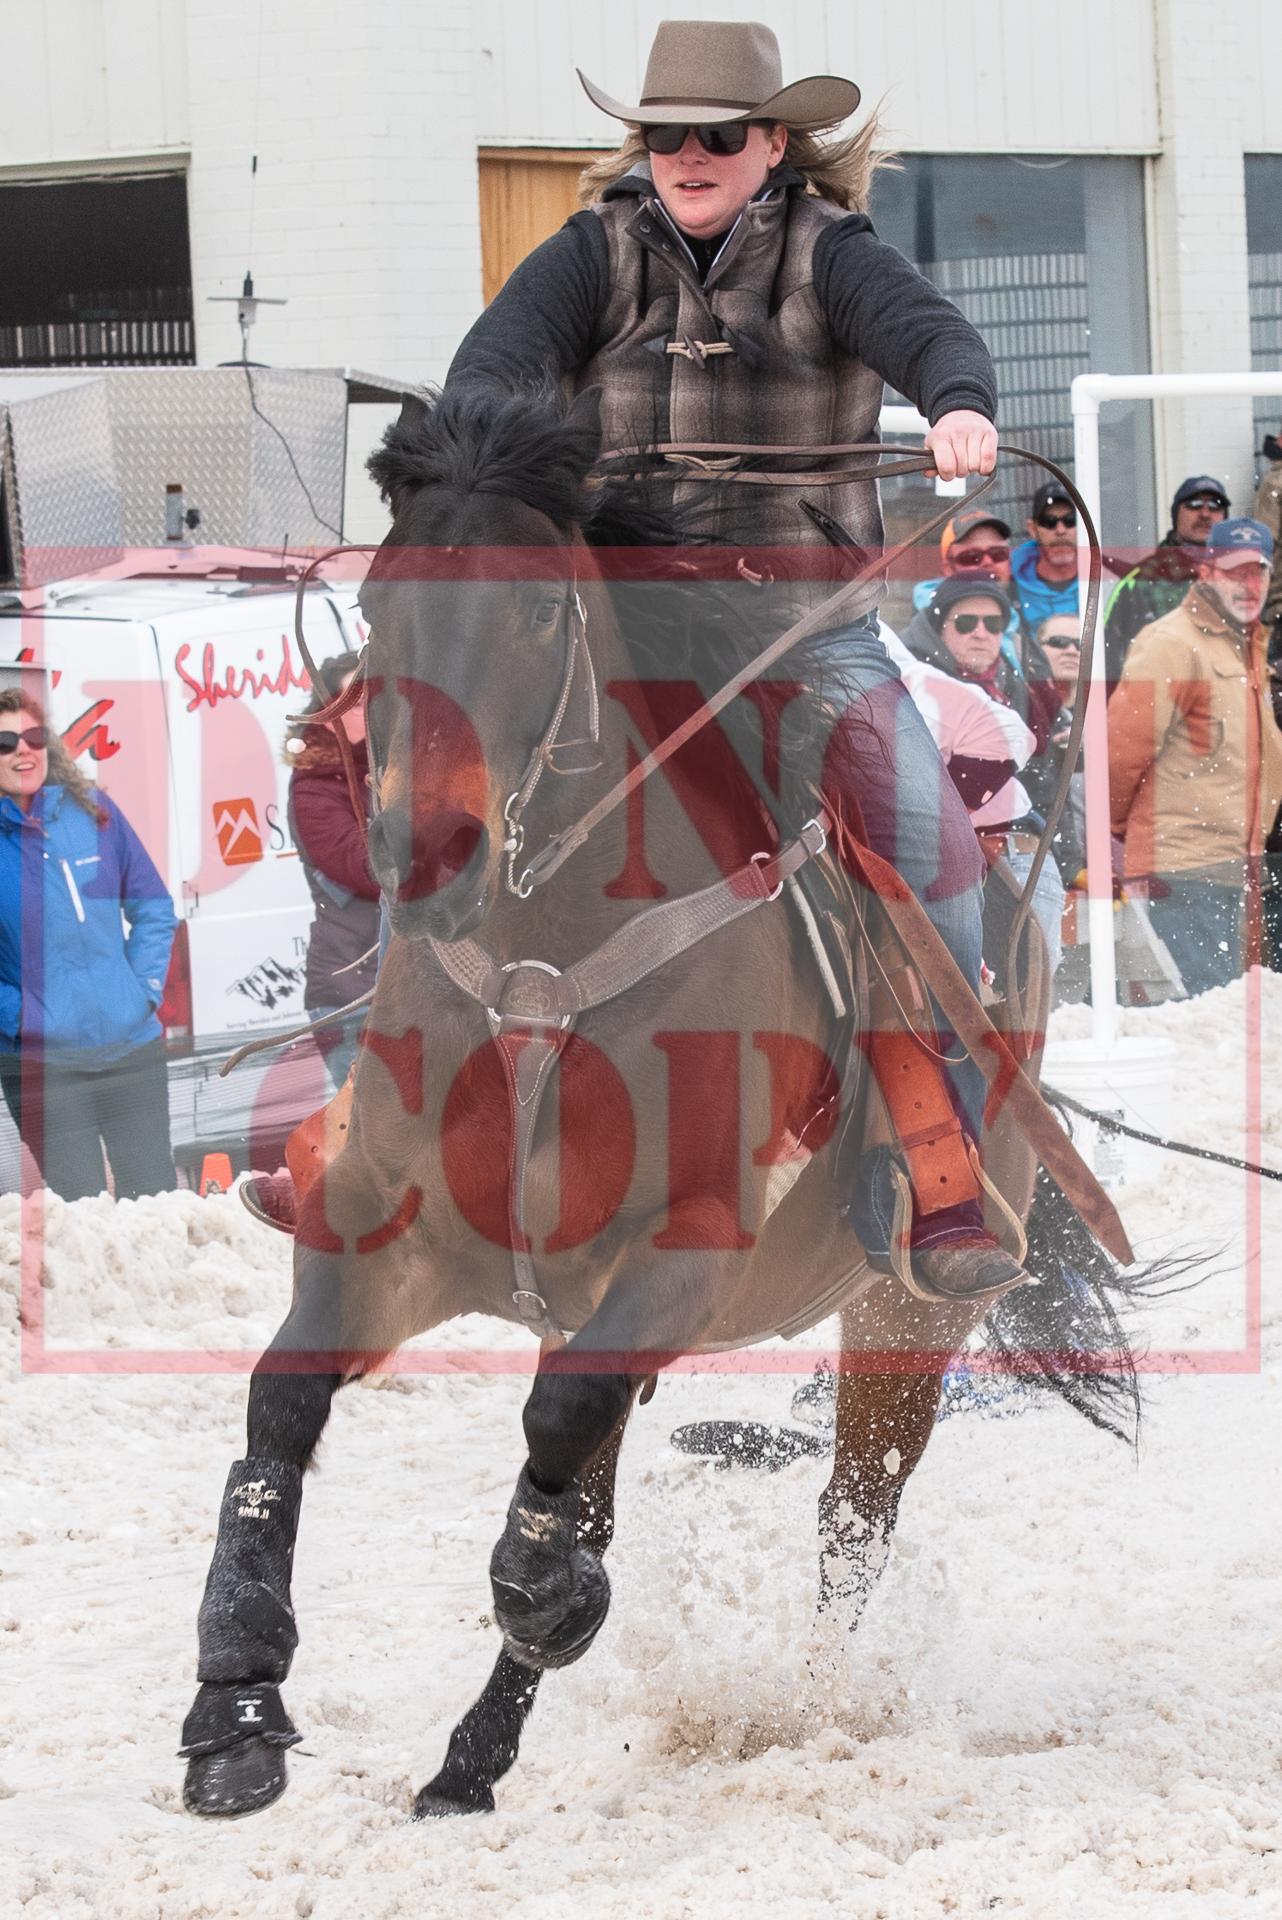 - Monica Plecker - Snowboard 5